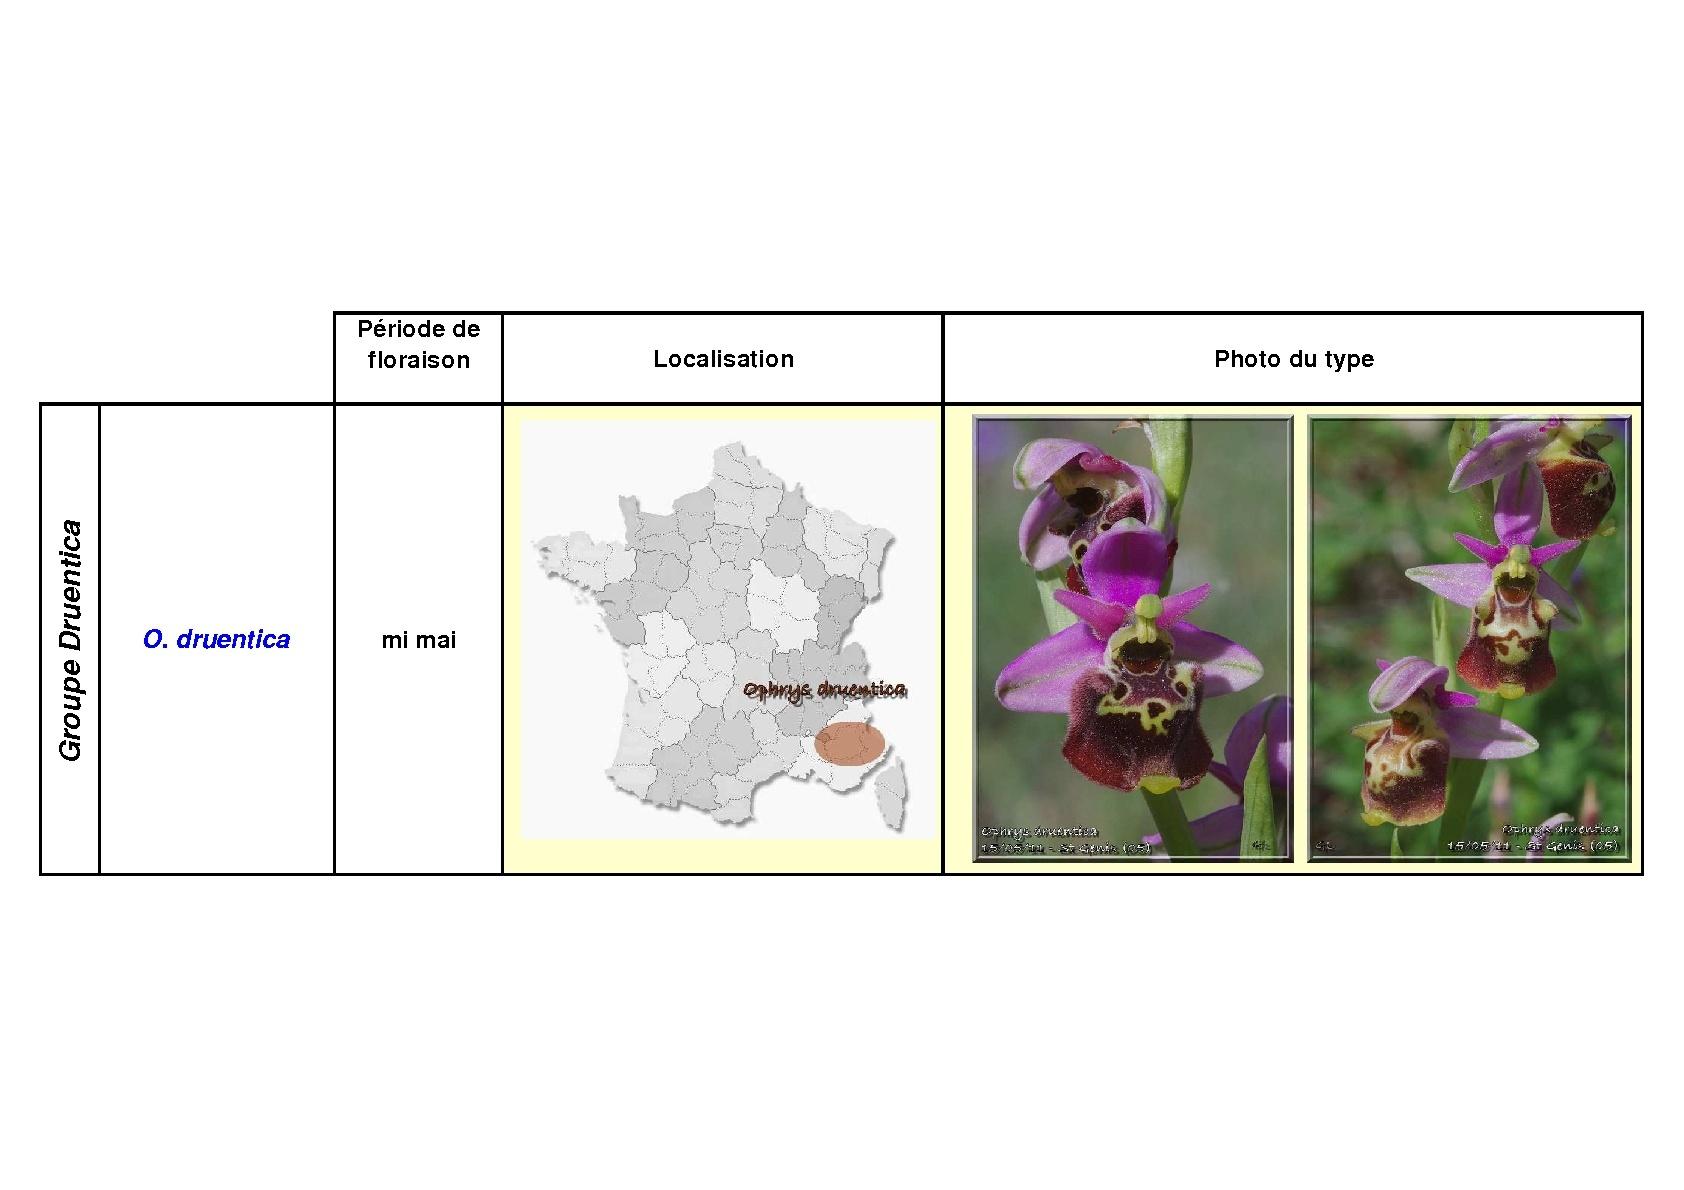 Le complexe fuciflora du Sud Est... simplifié Fucifl17